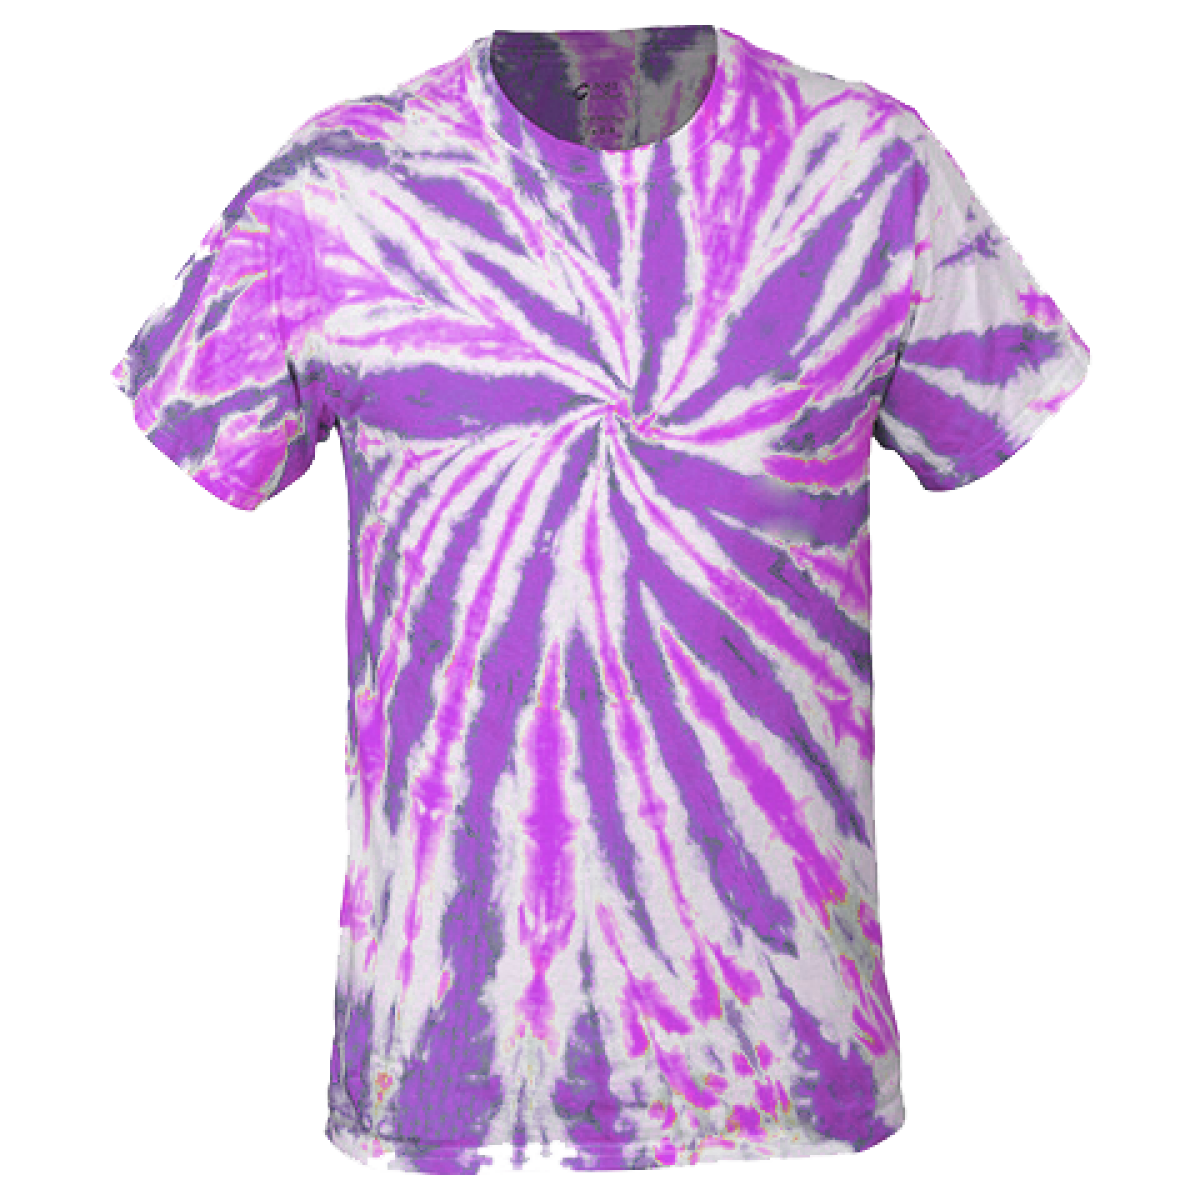 Multi-Color Tie-Dye Tee -Purple-S